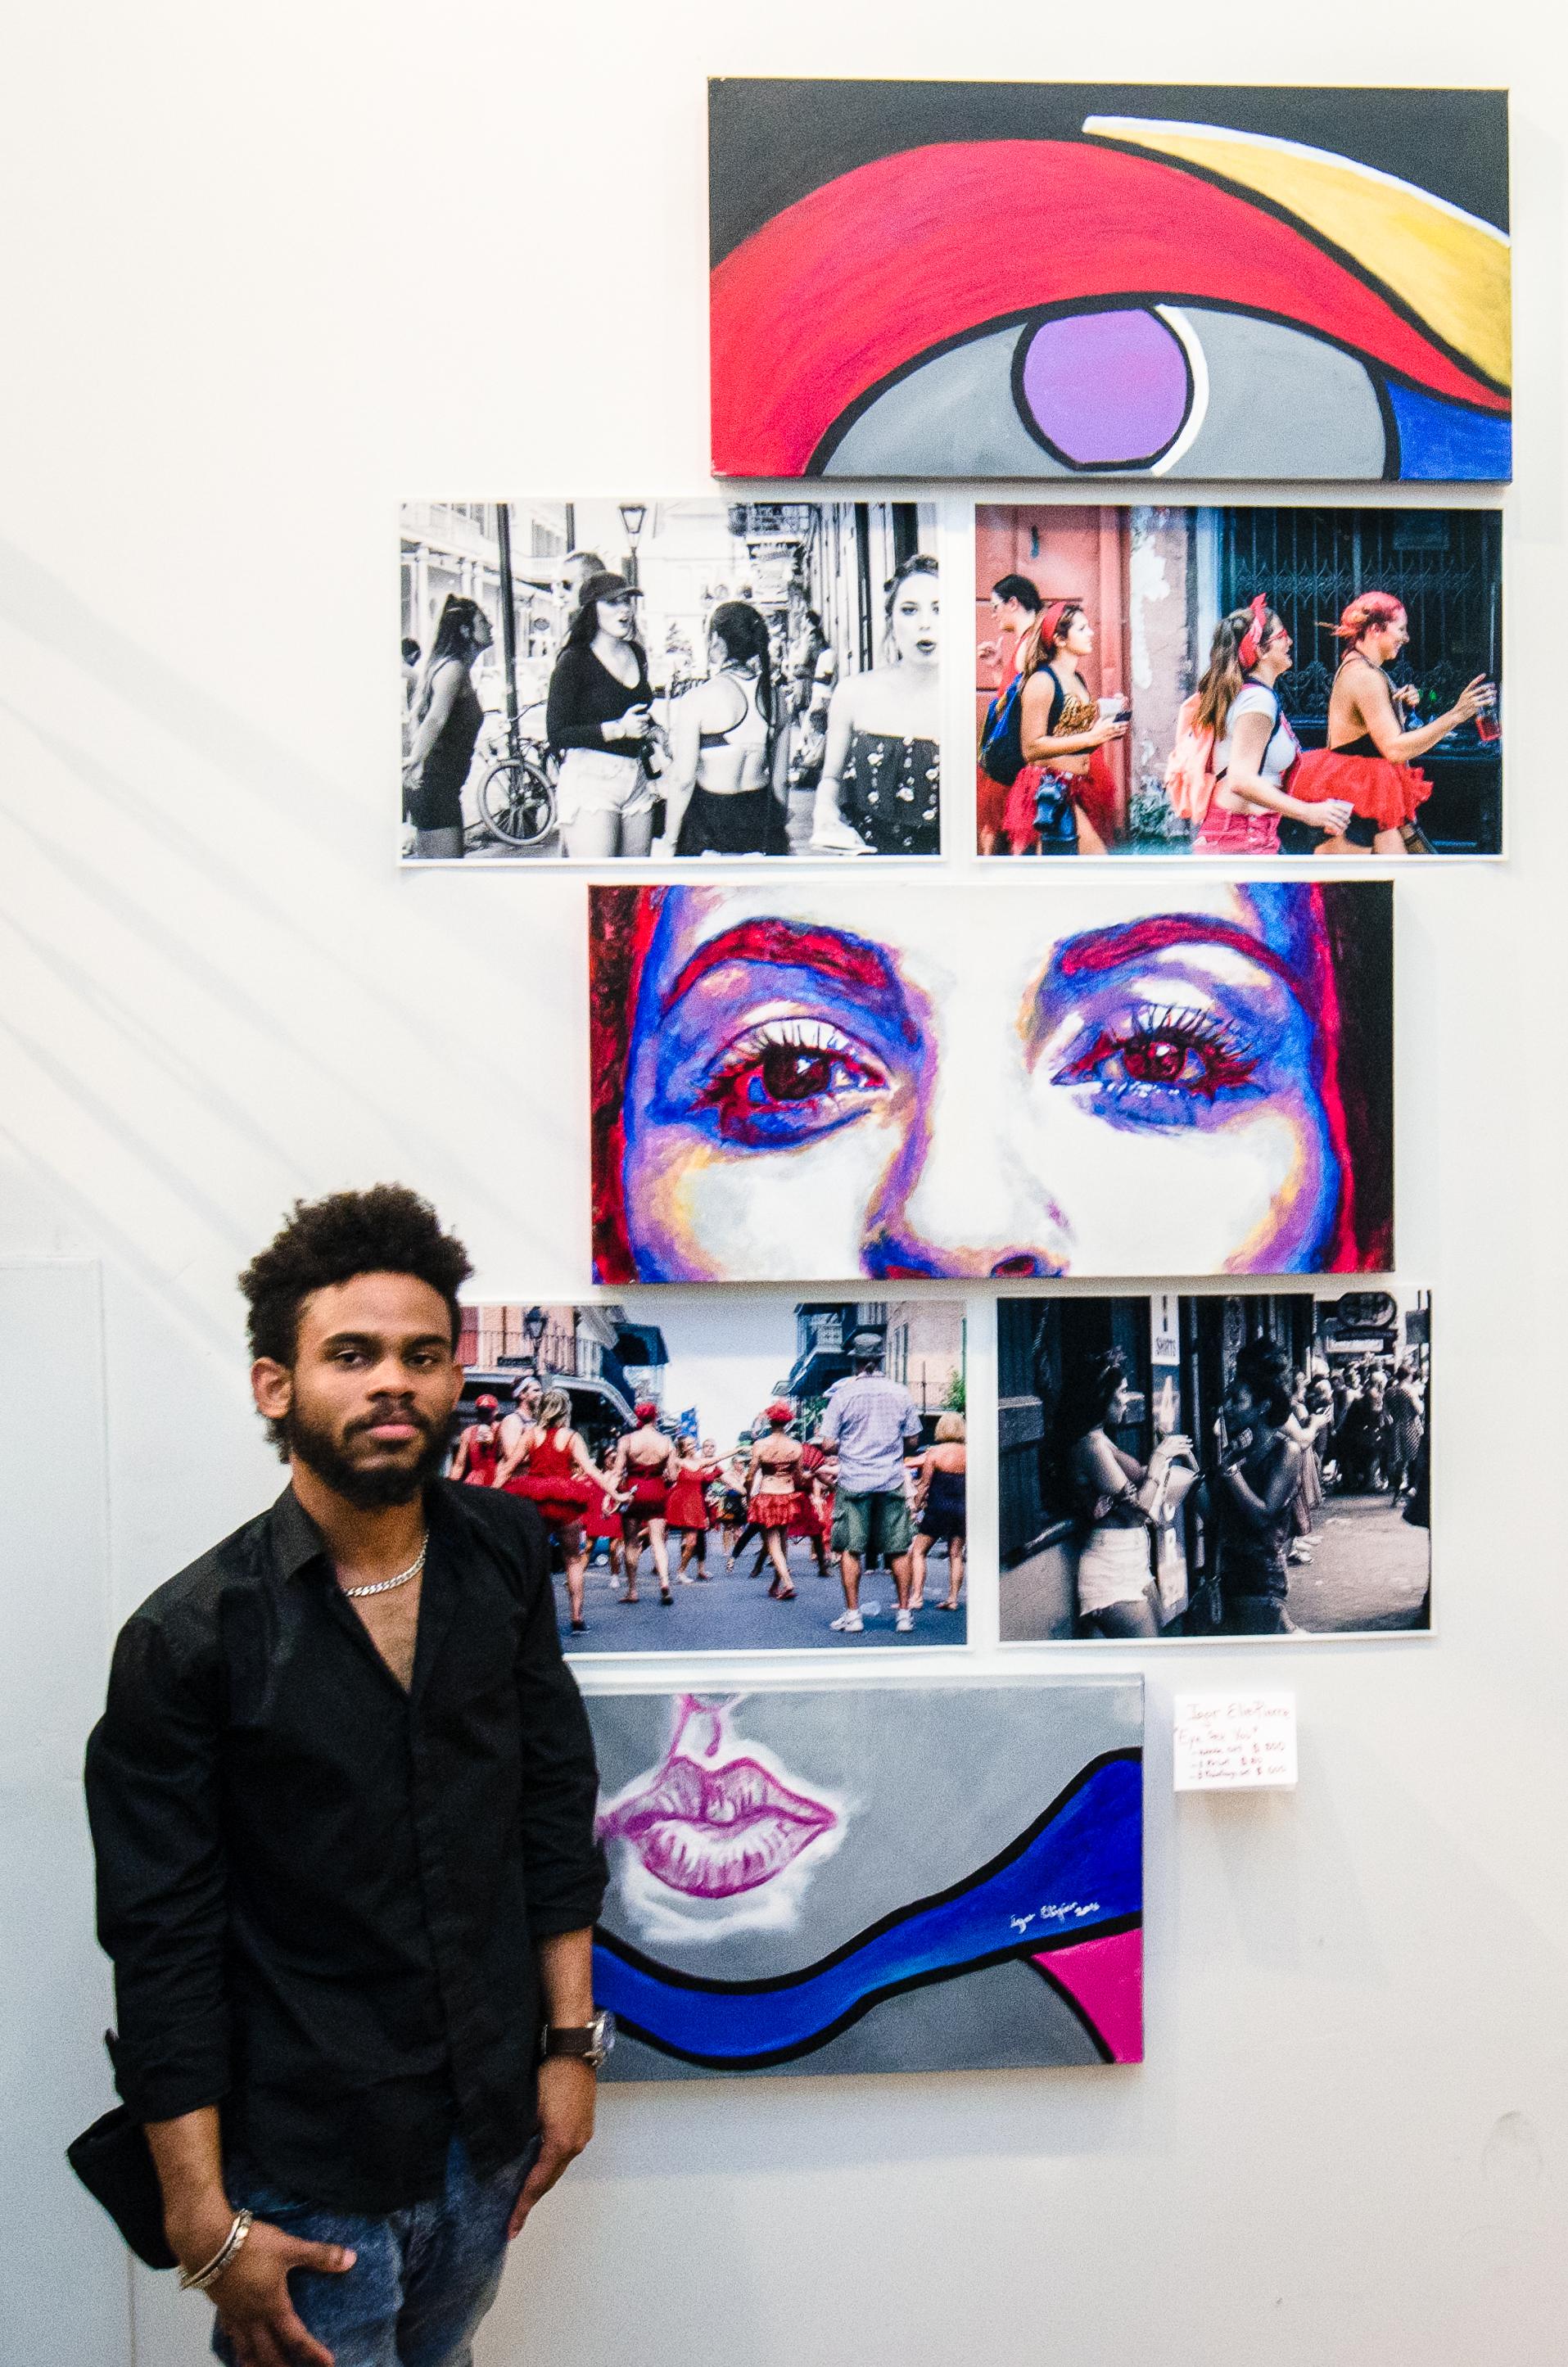 Igor at his exhibit in Toronto